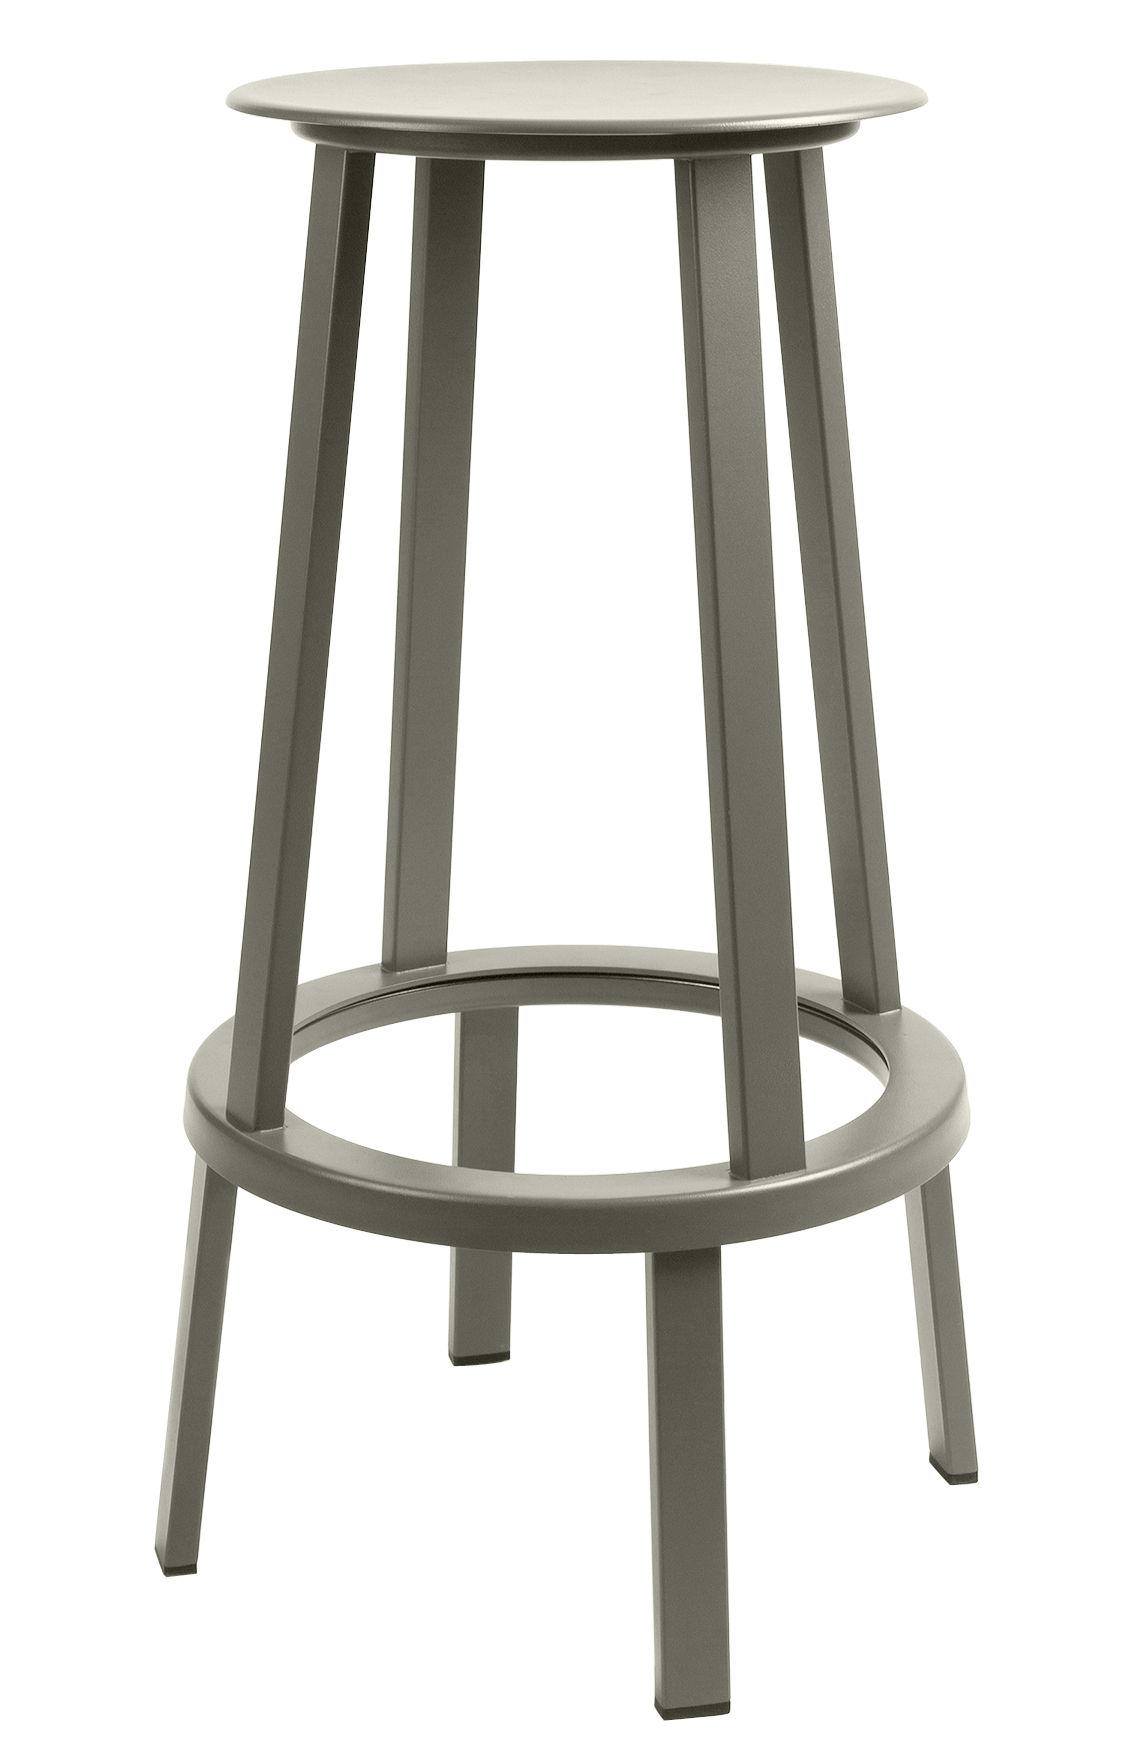 Furniture - Bar Stools - Revolver Swivel bar stool - H 75 cm - Metal by Hay - Grey - Steel xith epowy paint